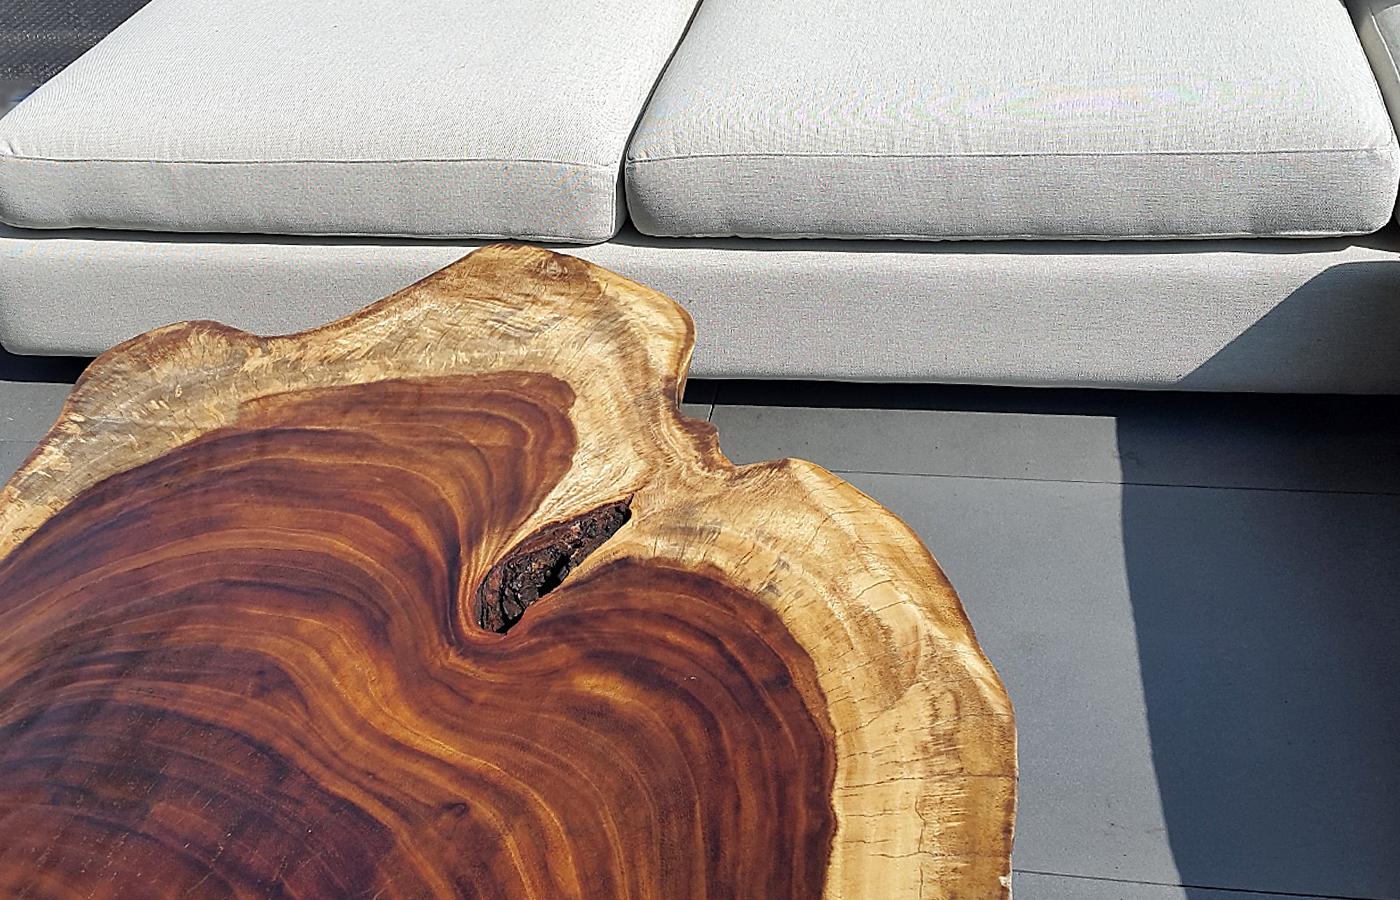 About parota wood